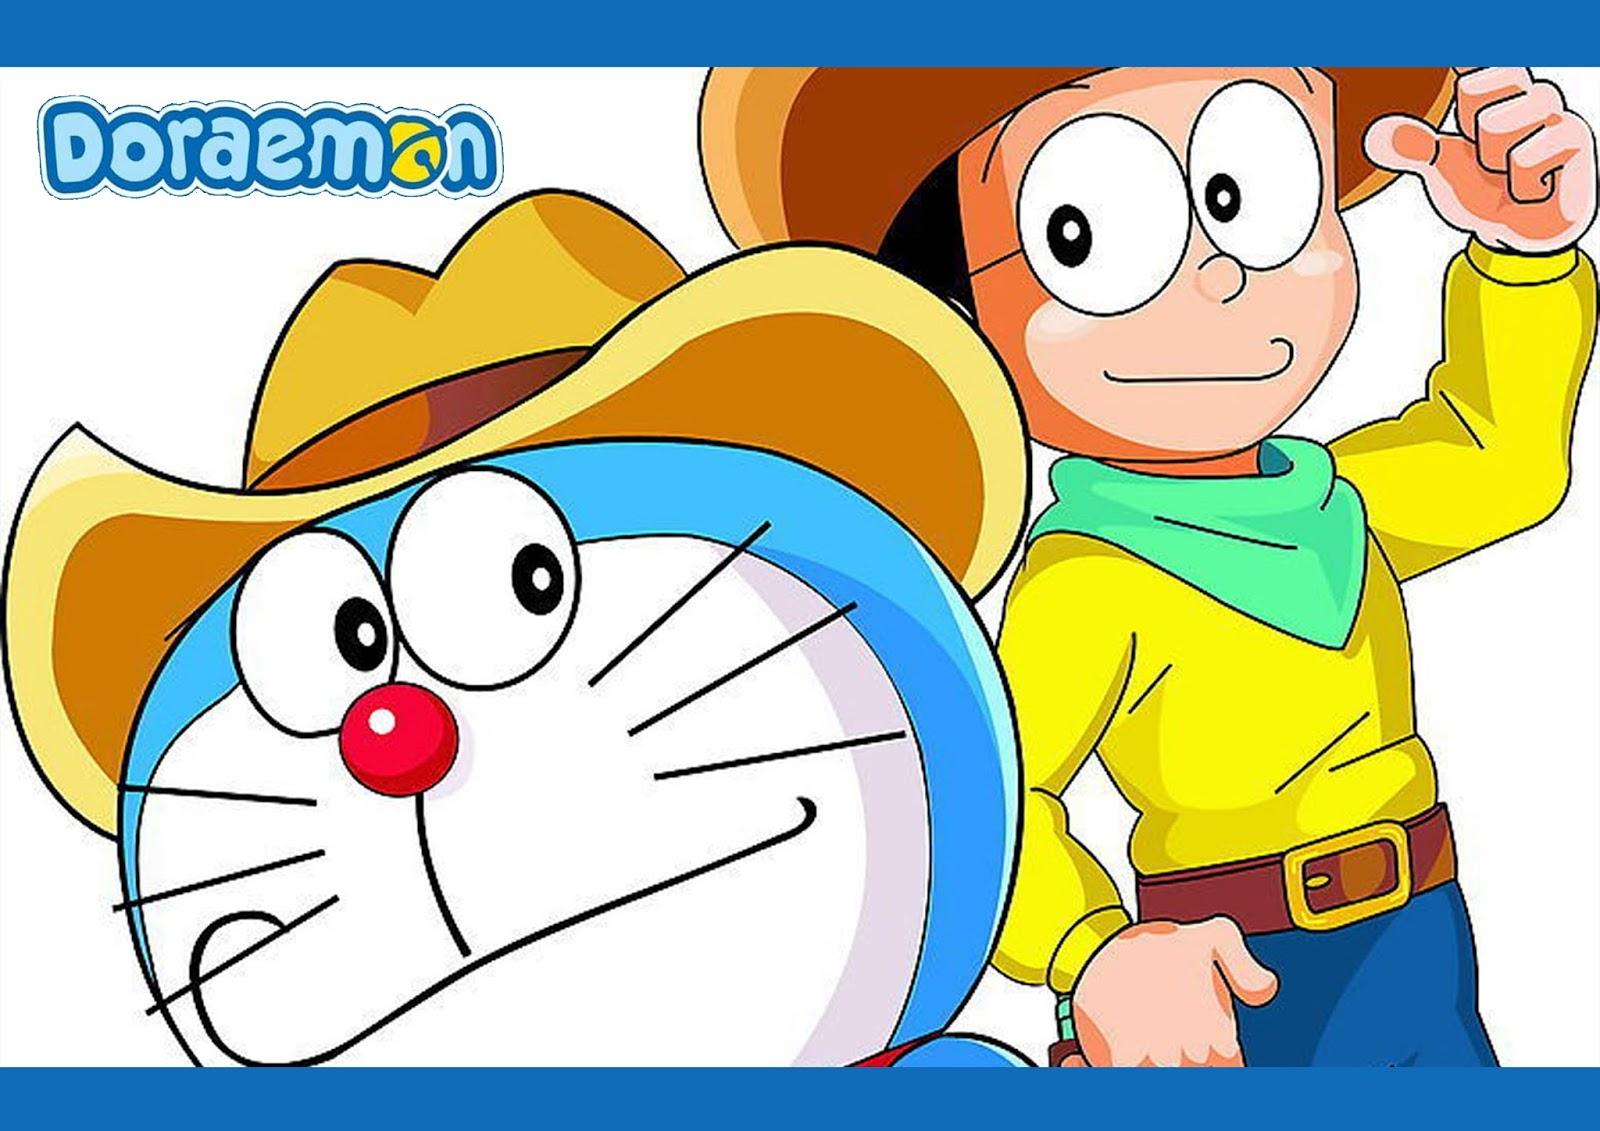 Ampuh abis Kumpulan Gambar Doraemon Lucu dan Unik